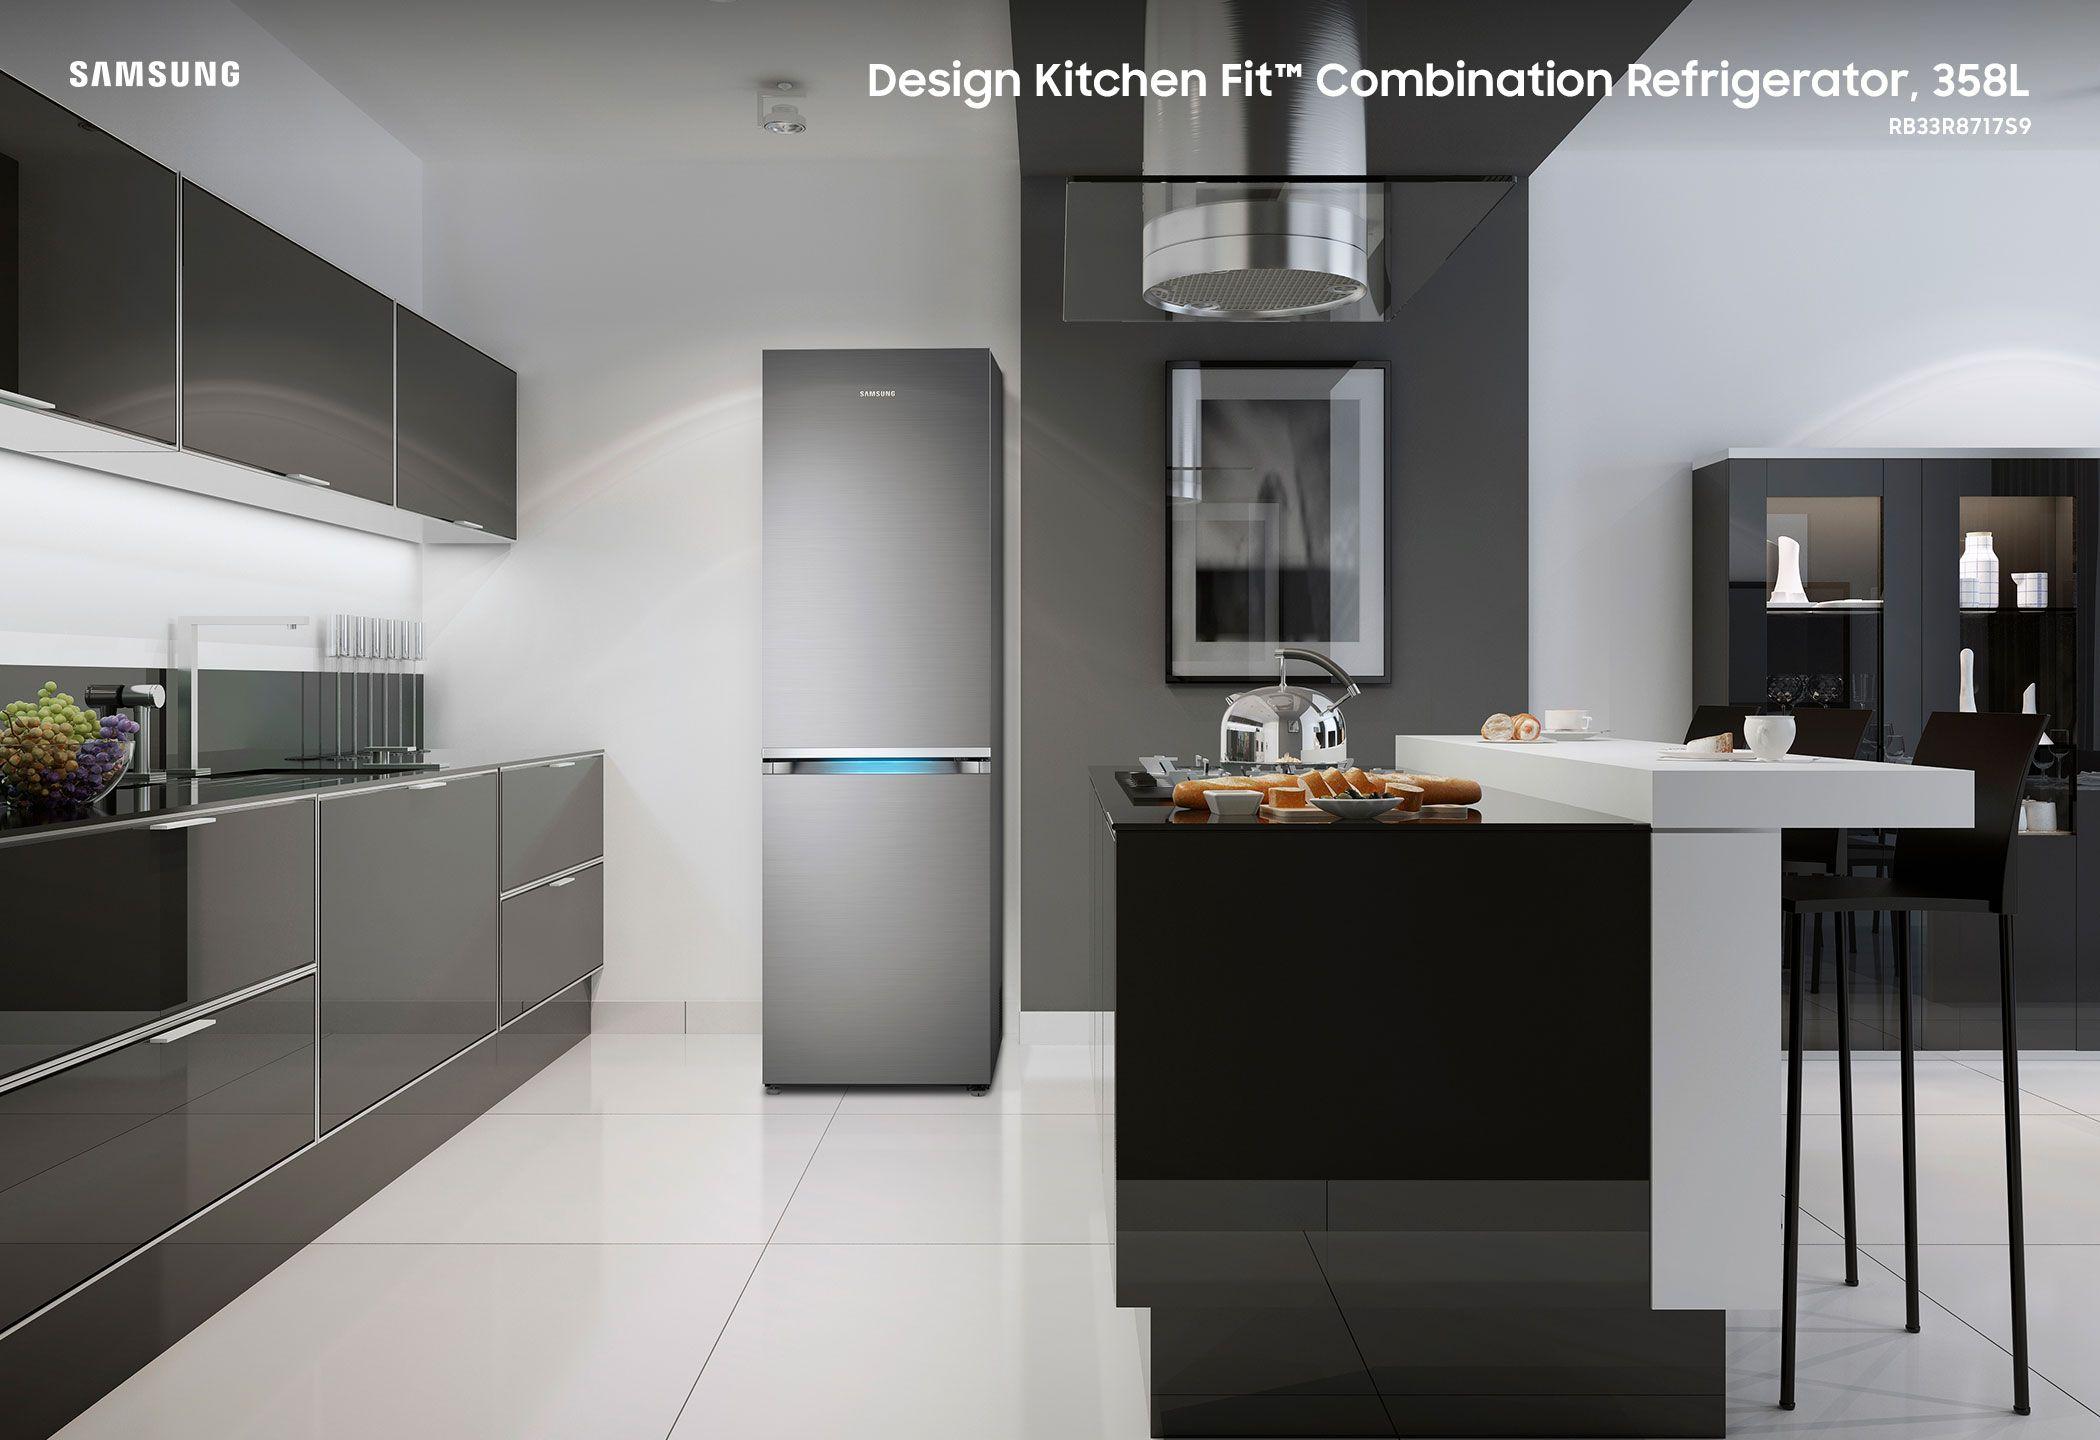 Design Kitchen Fit Combination Refrigerator 358l Bottomfreezer